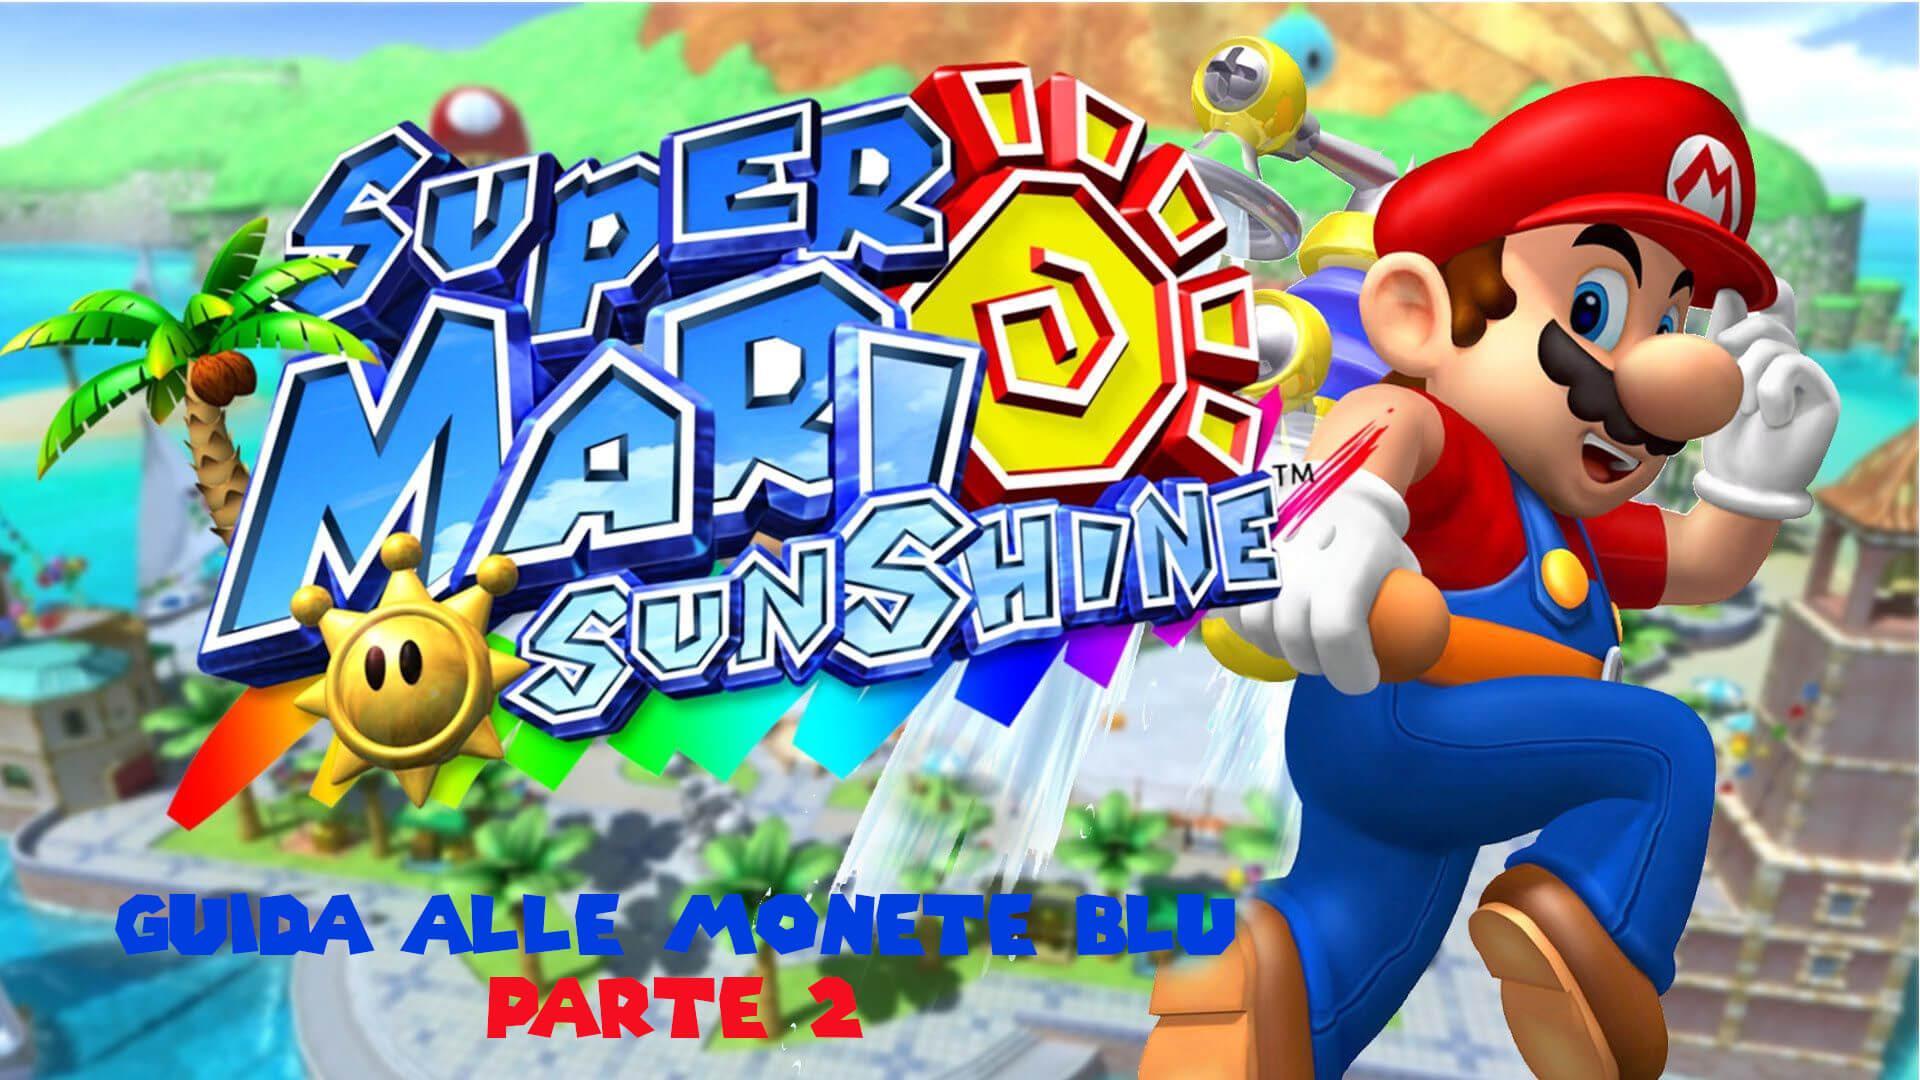 Cover Mario Sunshine Guida 2